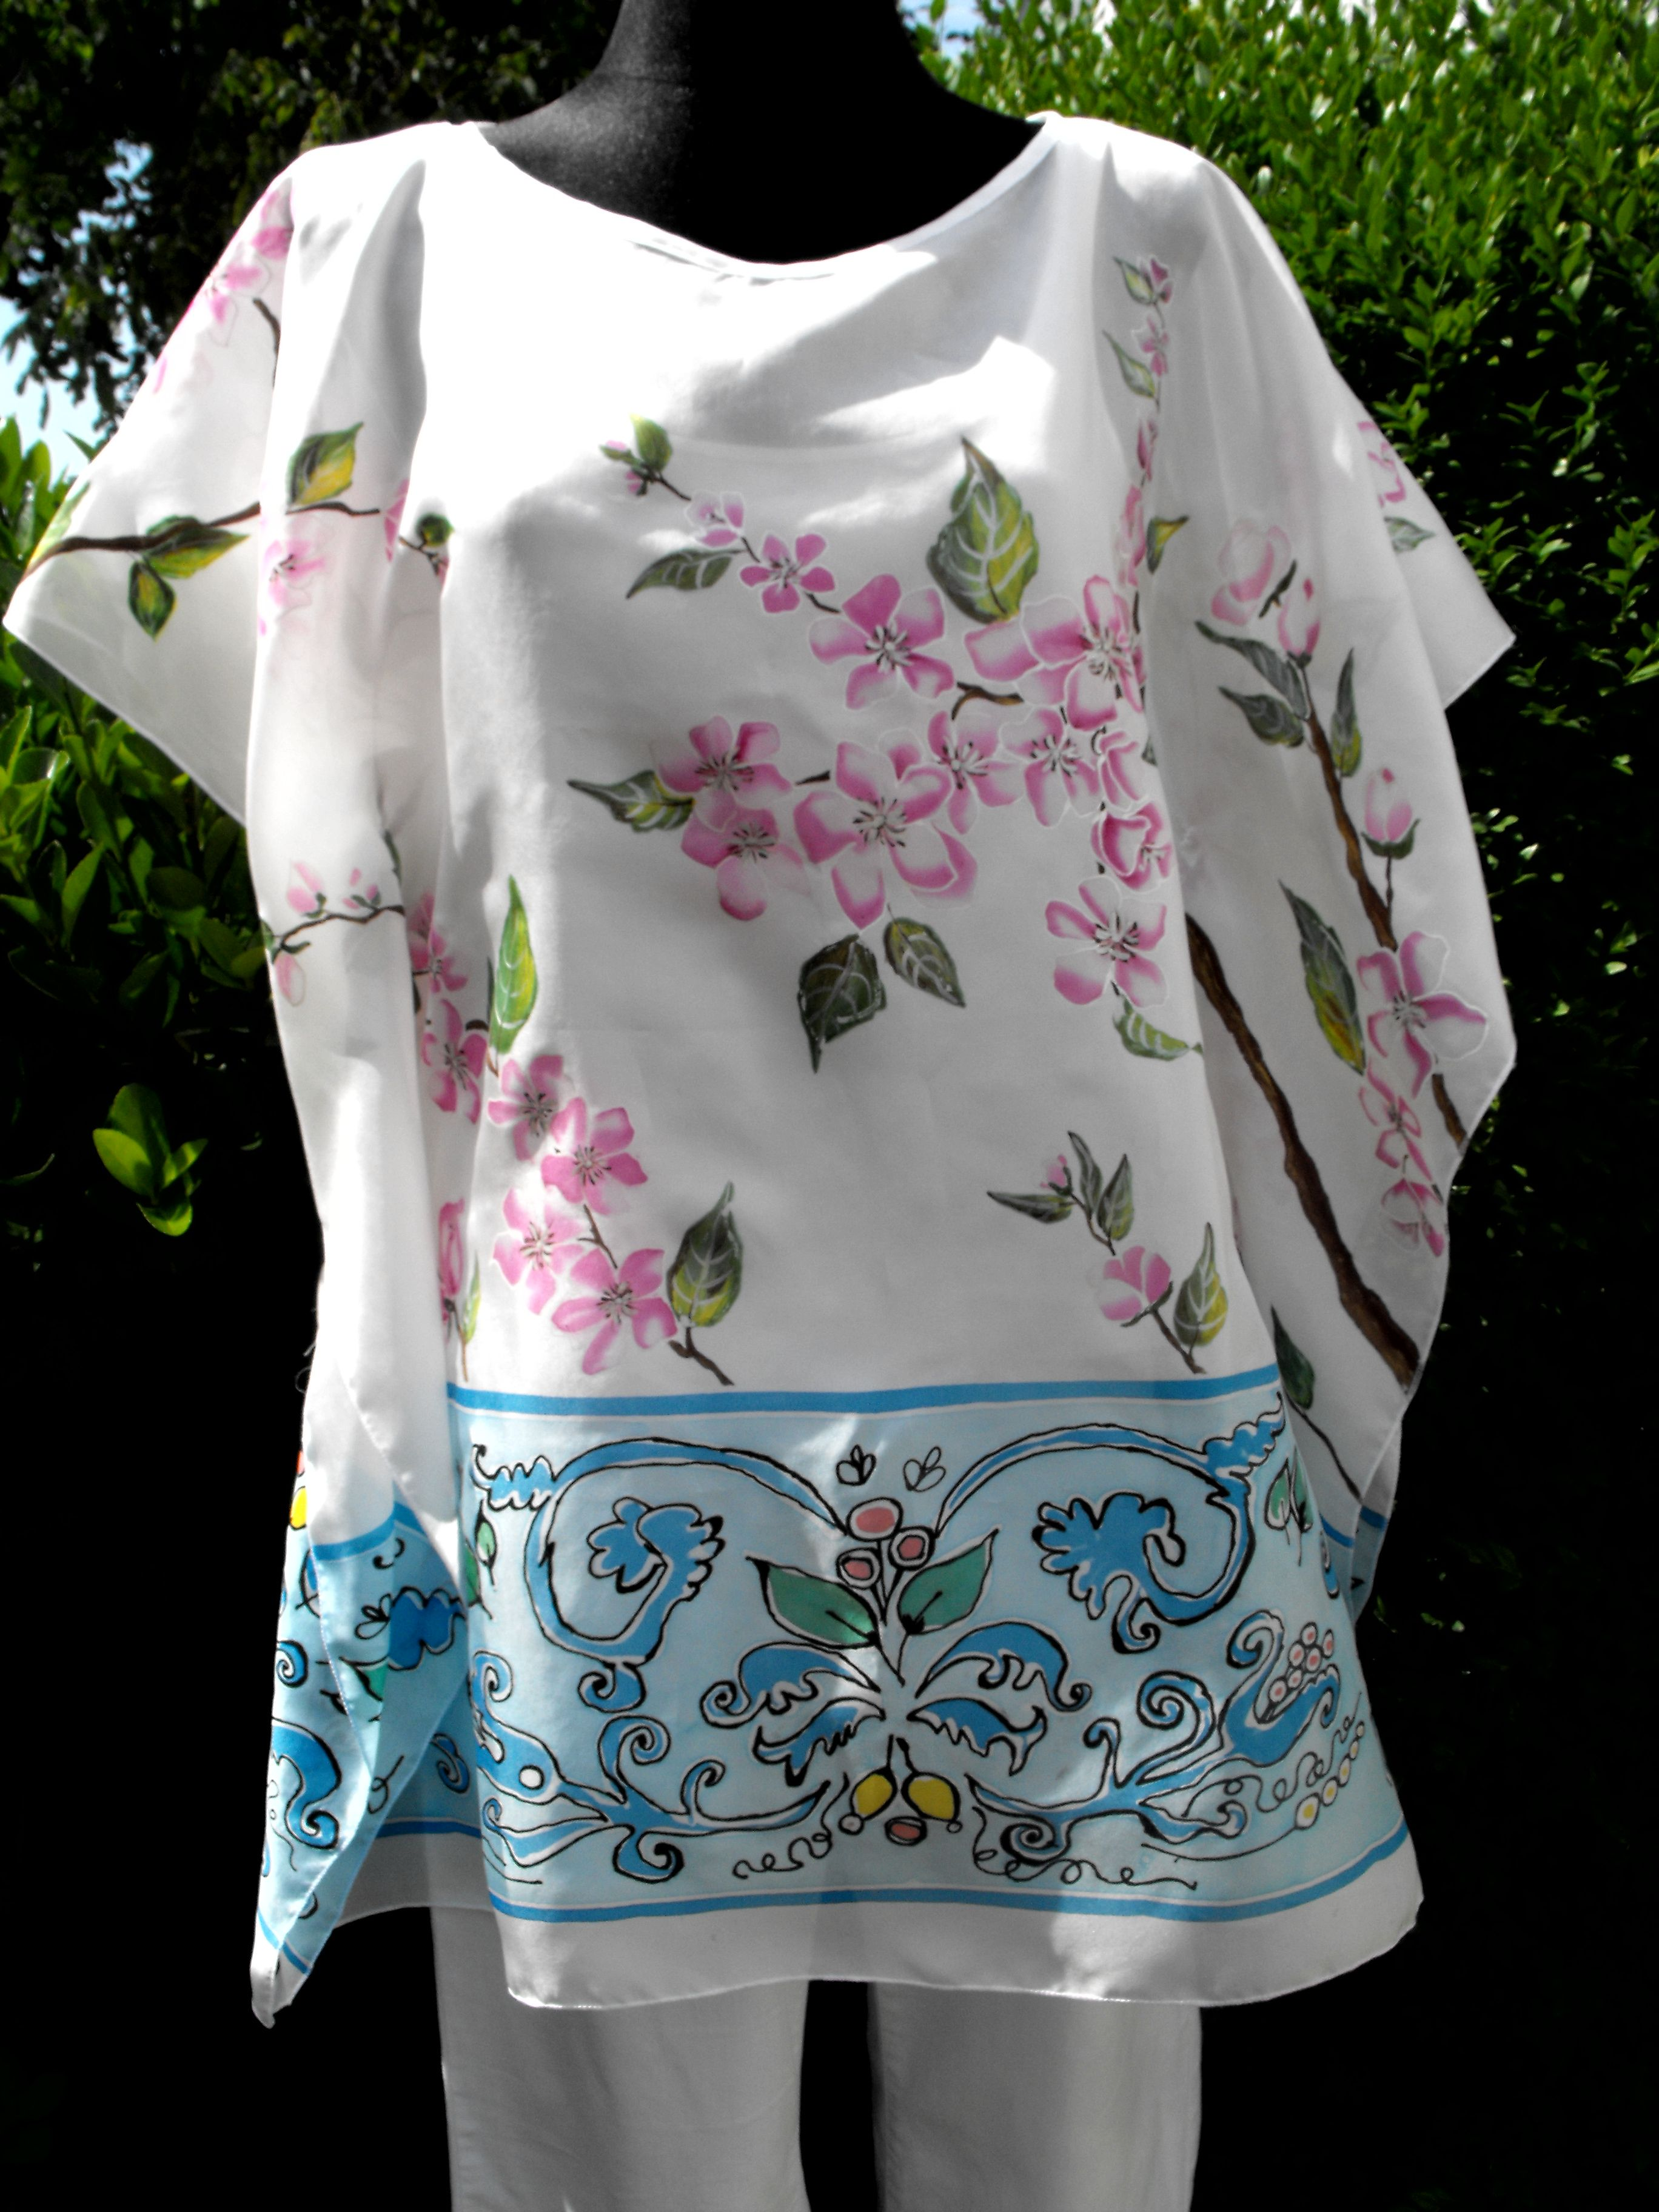 The kaftan for summer - 100% silk Habotai, hand painted - Ivana Cifranic